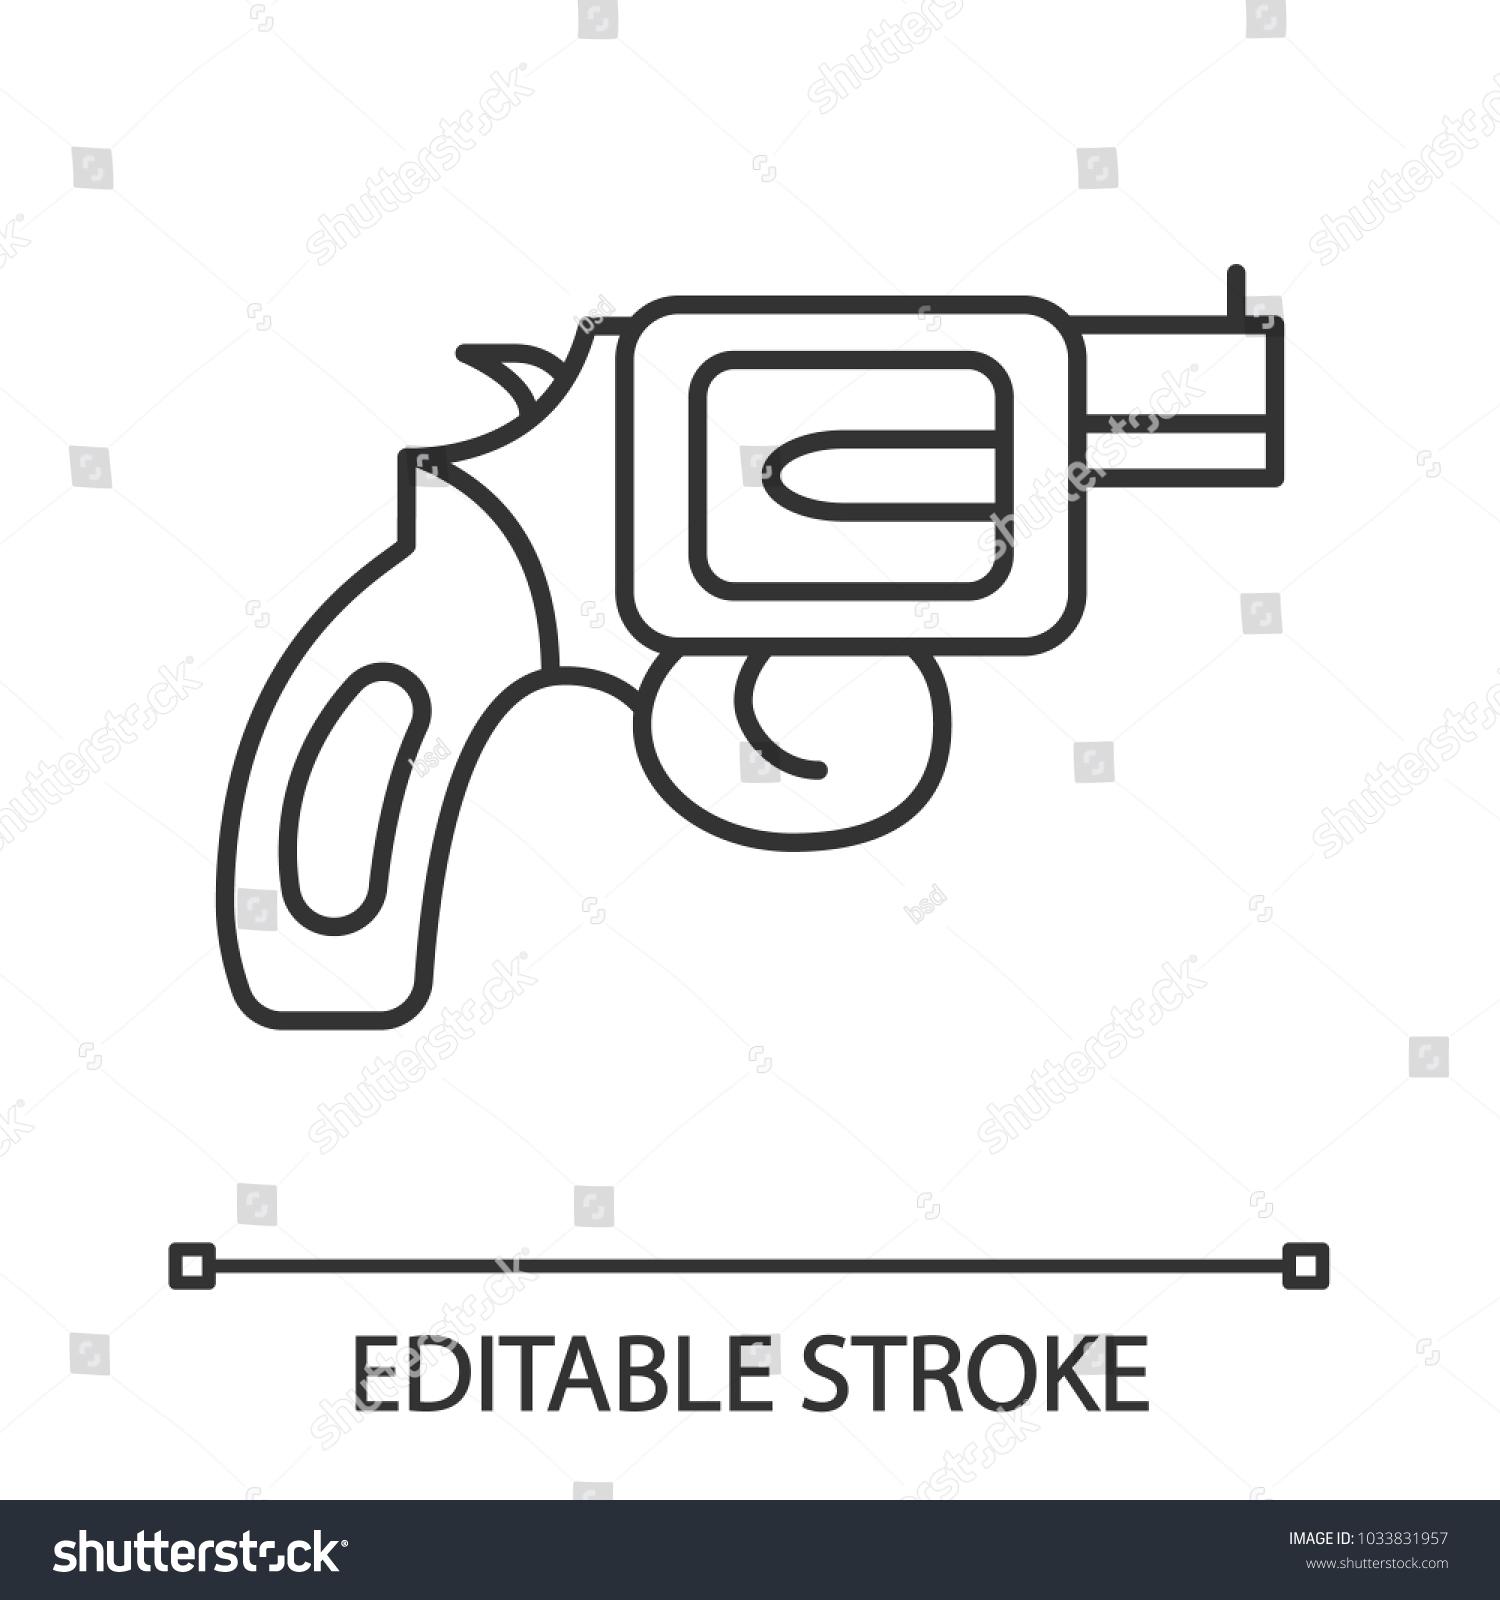 Pistol text symbol gallery symbol and sign ideas pistol text symbol choice image symbol and sign ideas revolver linear icon pistol gun thin stock biocorpaavc